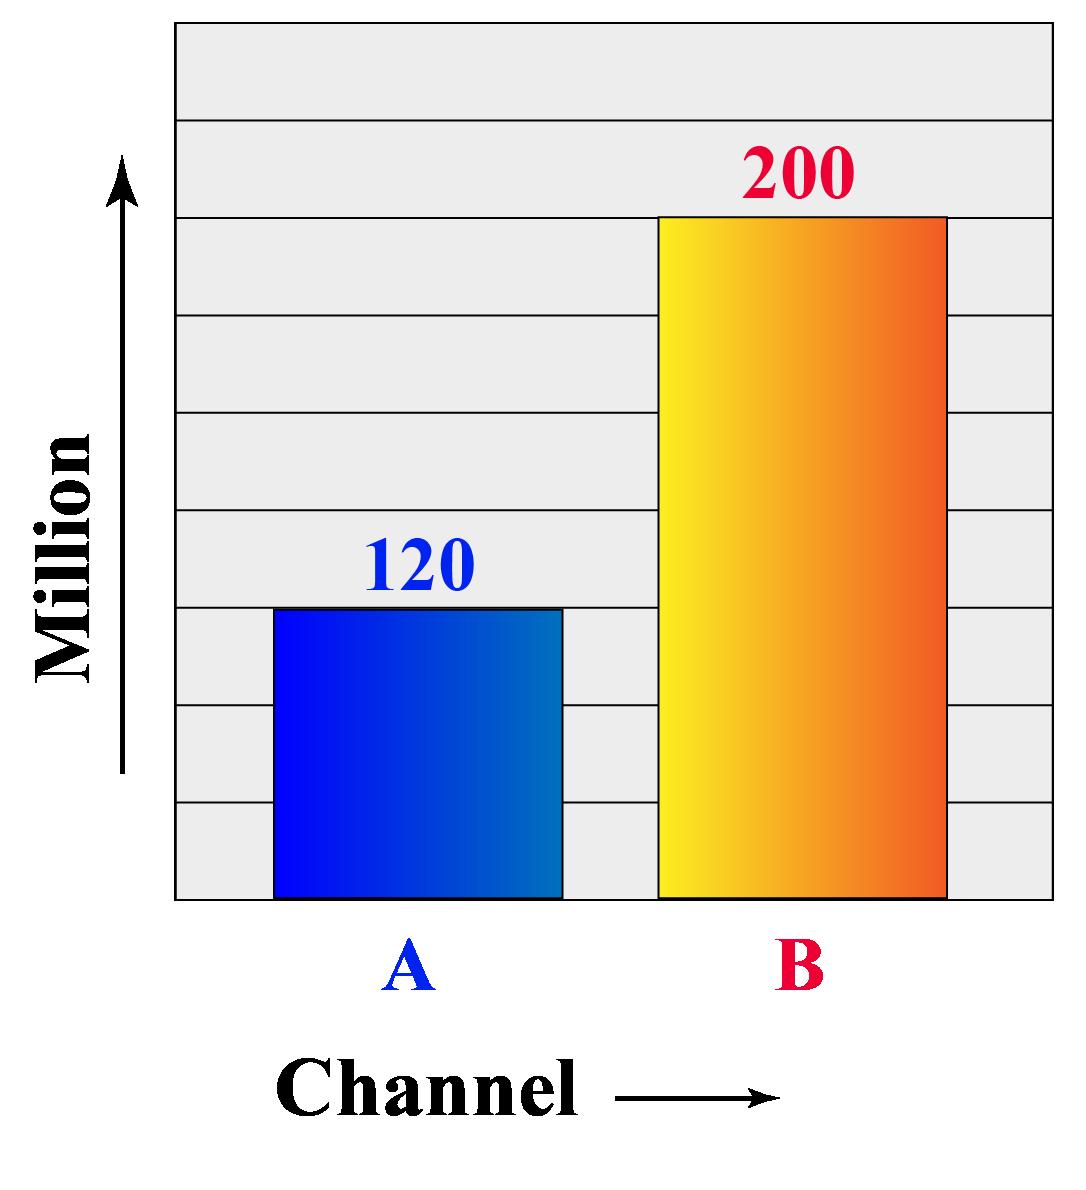 truncated Y-axis